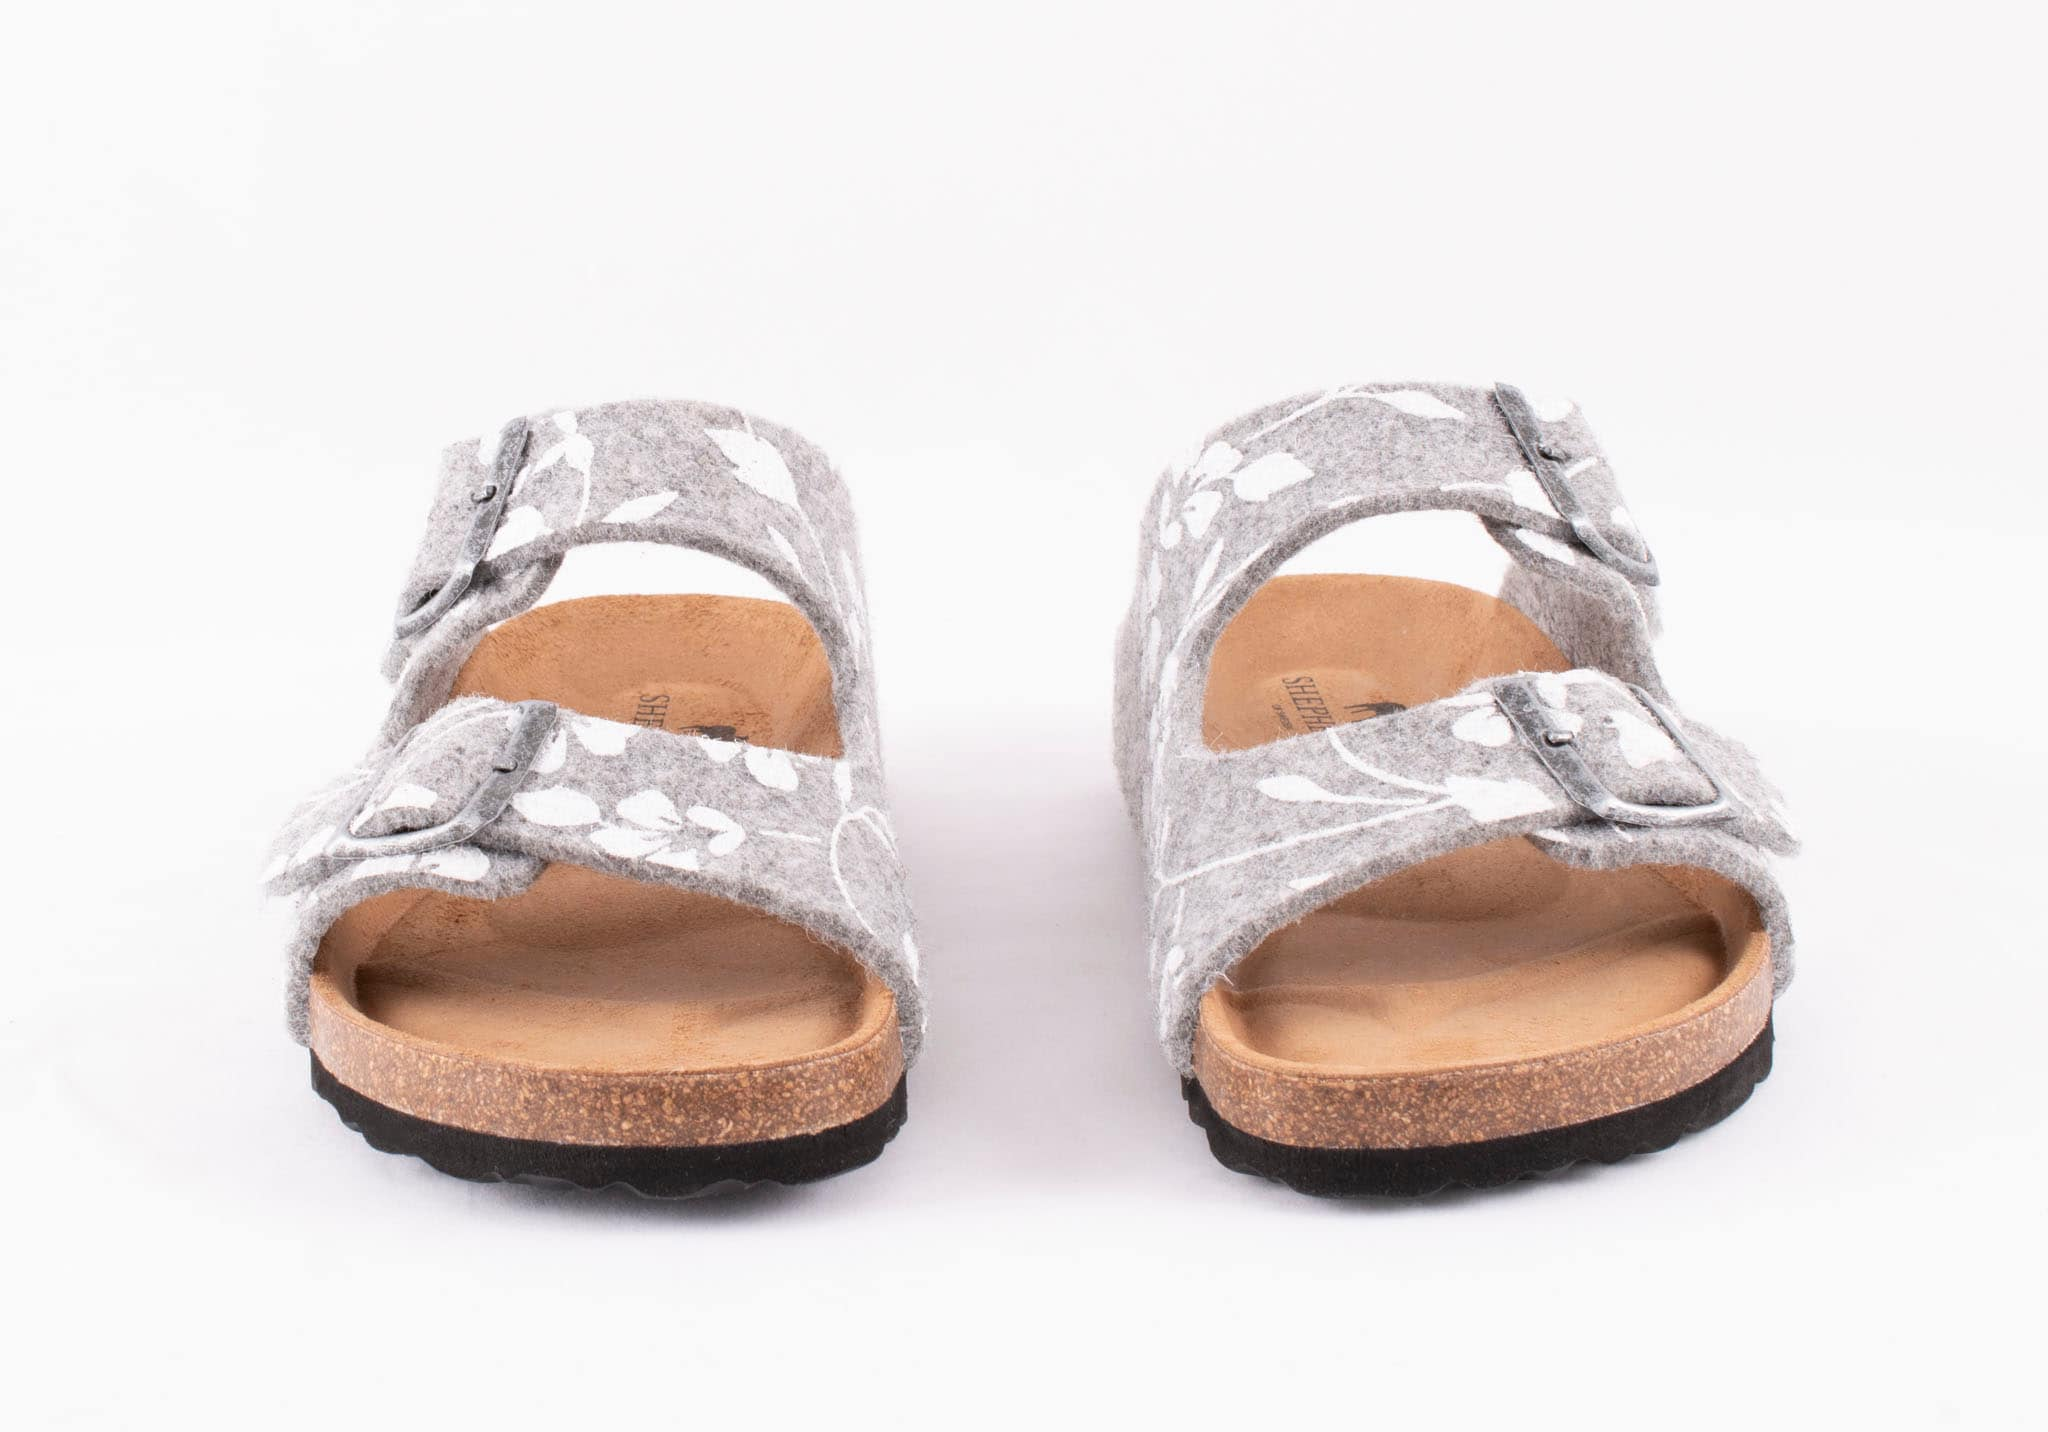 Mathilda sandals